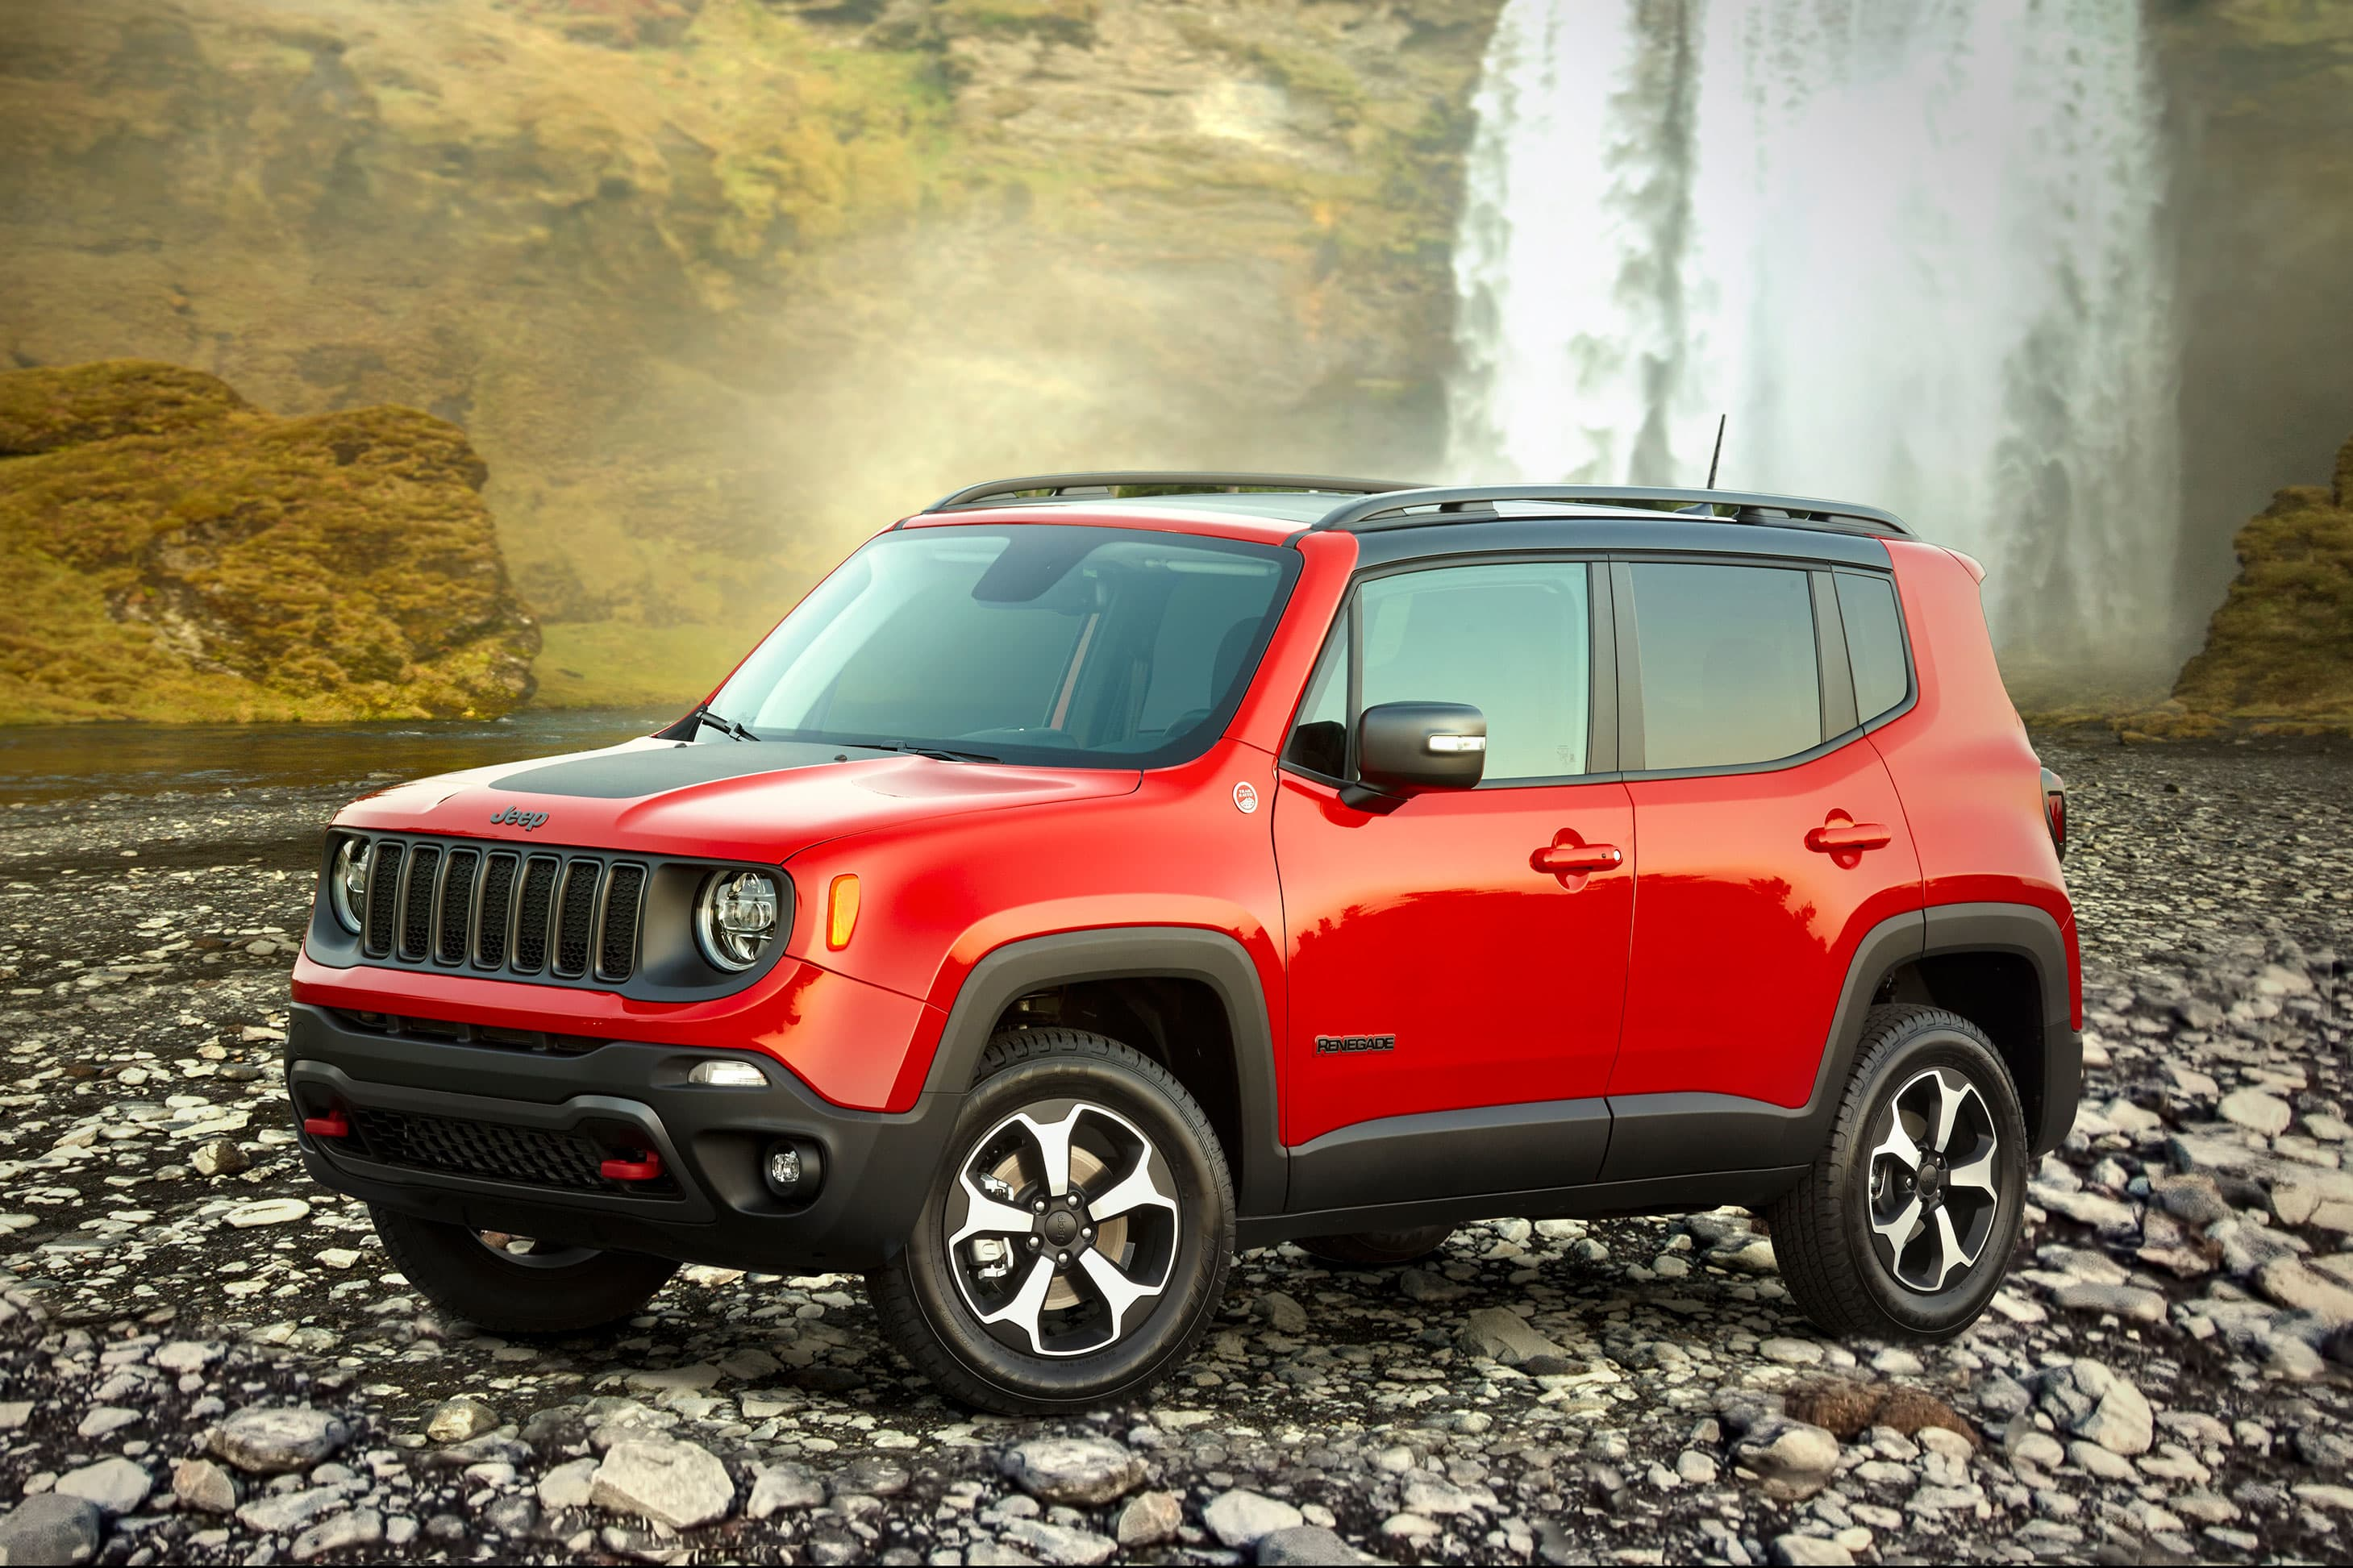 Fiat Chrysler prepares to produce plug-in hybrid Jeep Renegade